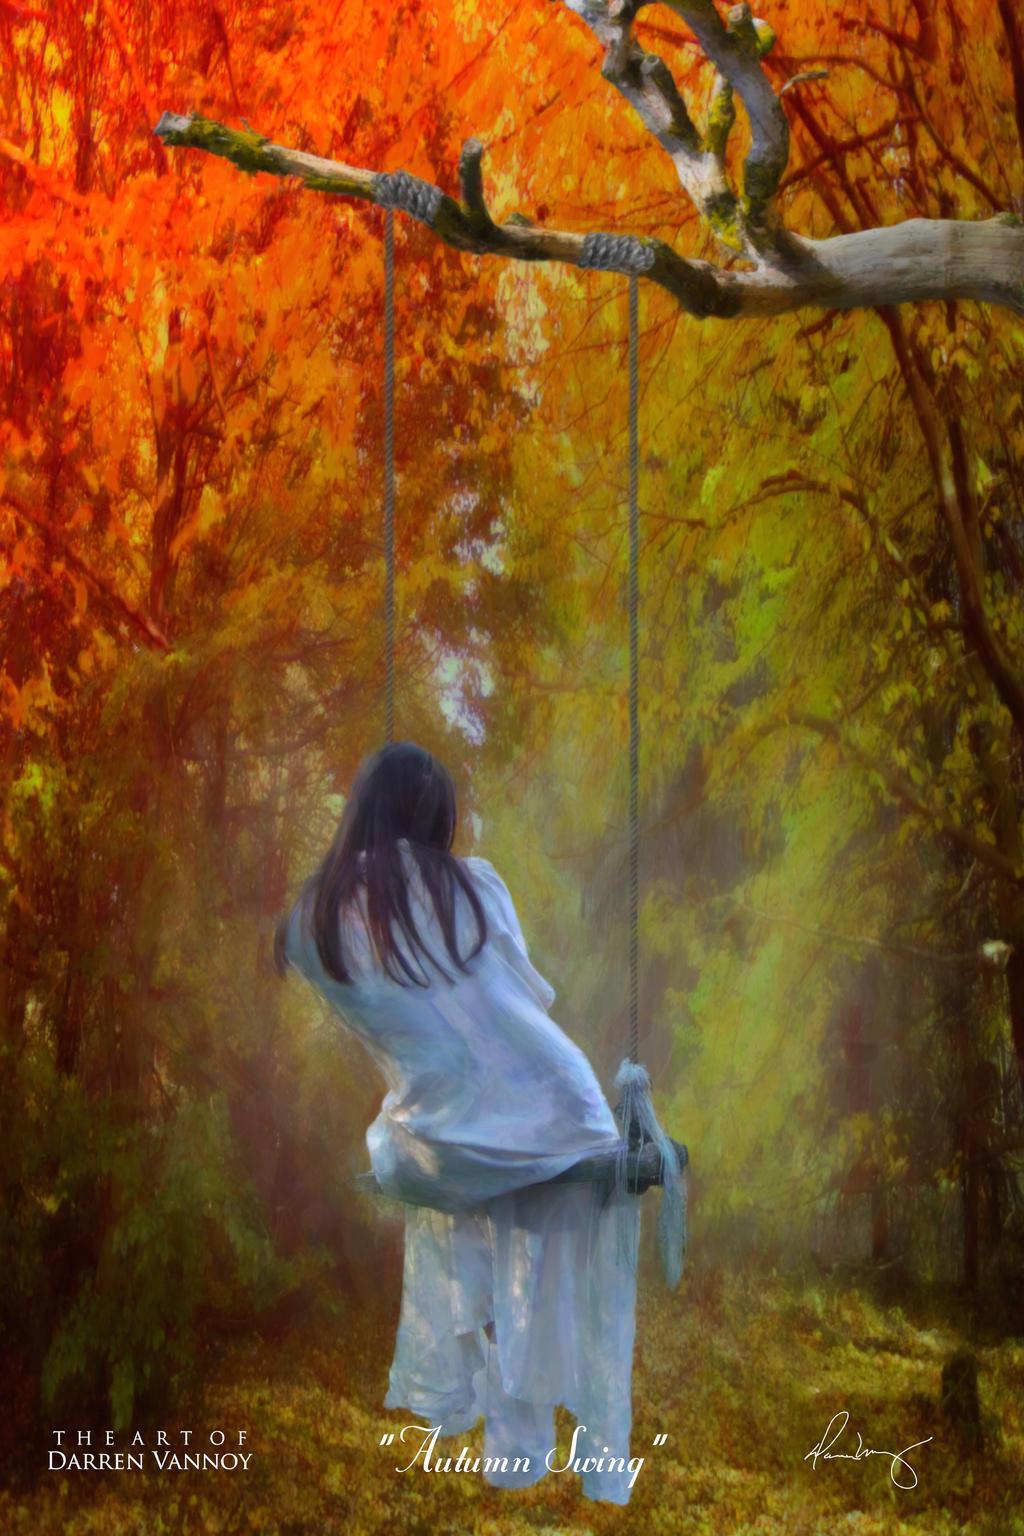 Autumn Swing by theartofdarrenvannoy